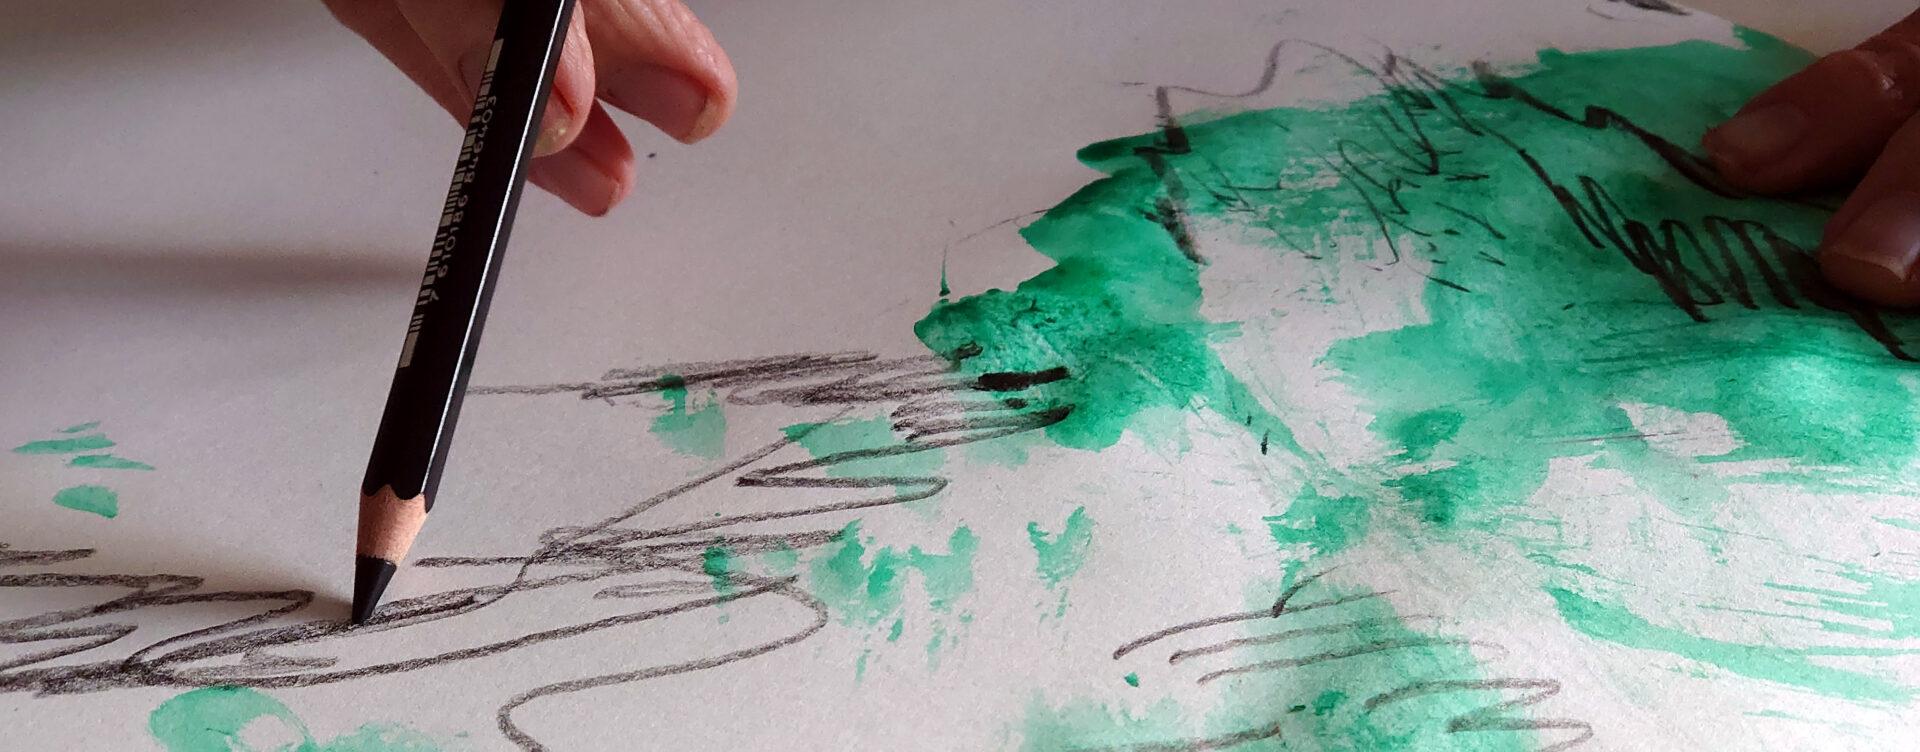 Kunsttherapie-senioren-andreas-hett